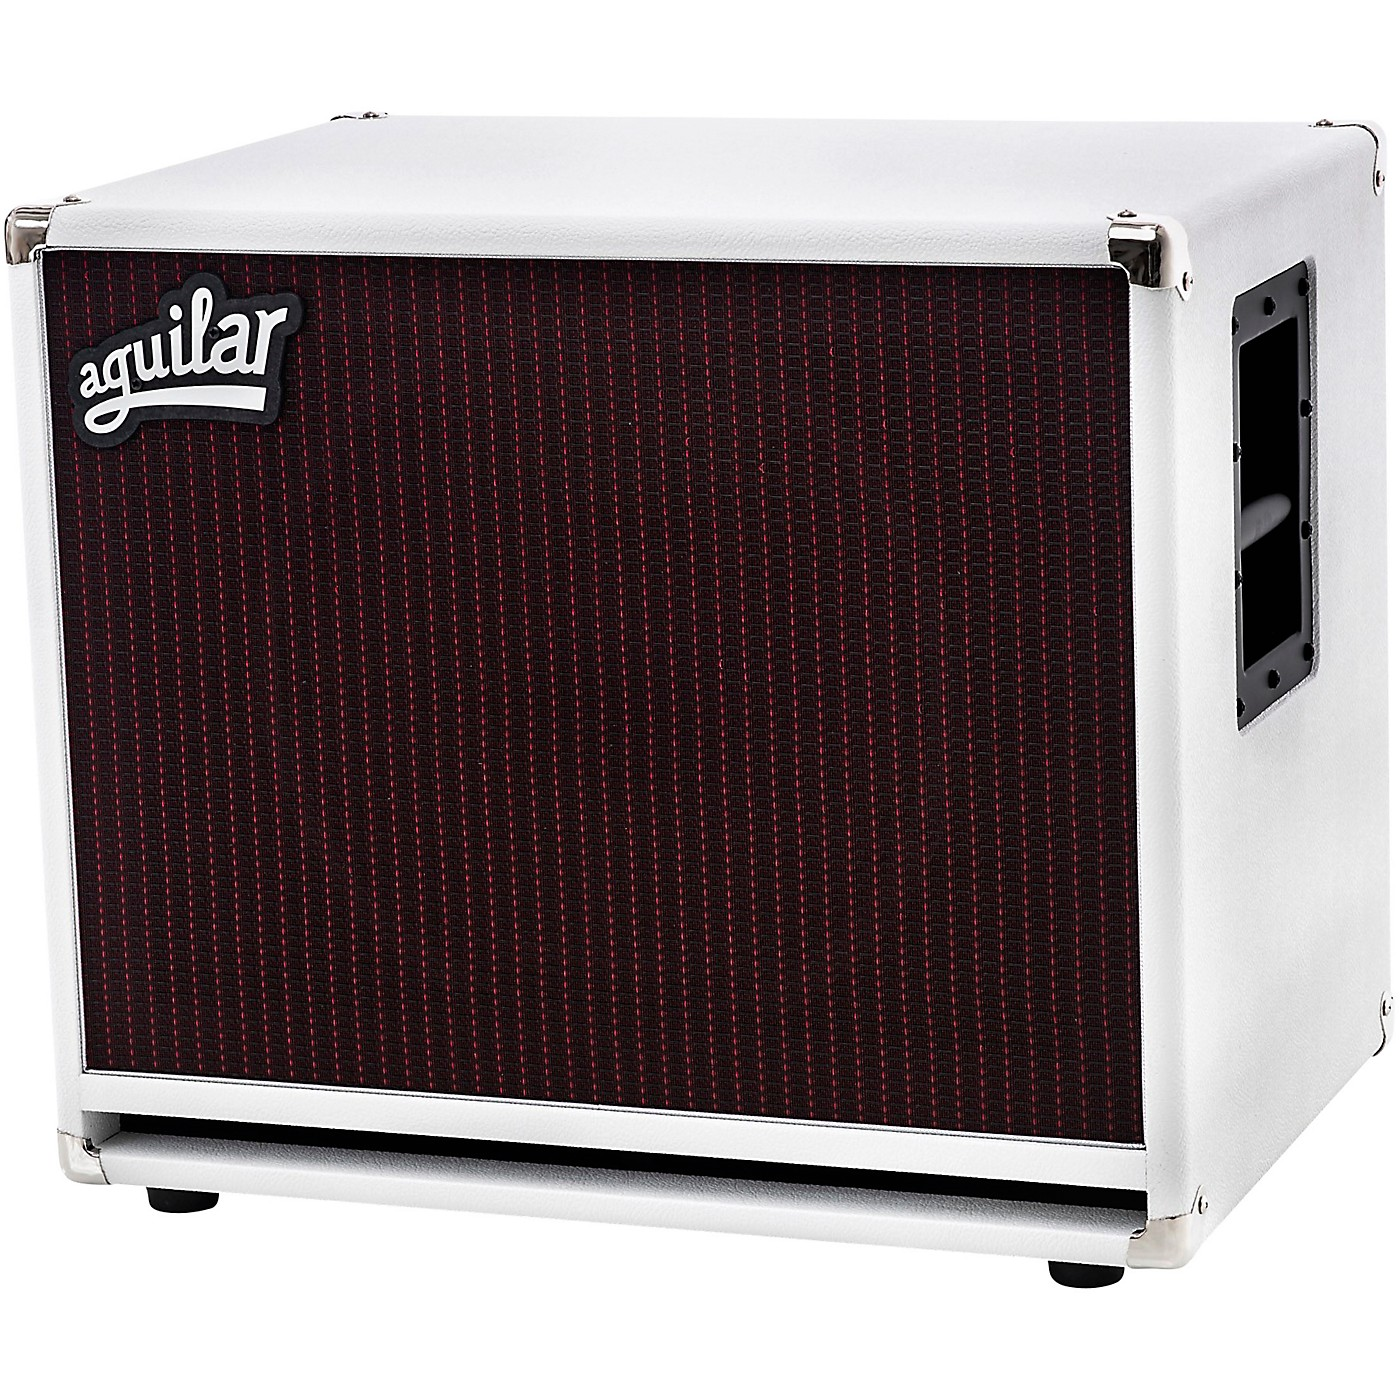 Aguilar DB 115 White Hot 400W 1x15 Bass Speaker Cabinet - 8 ohm thumbnail